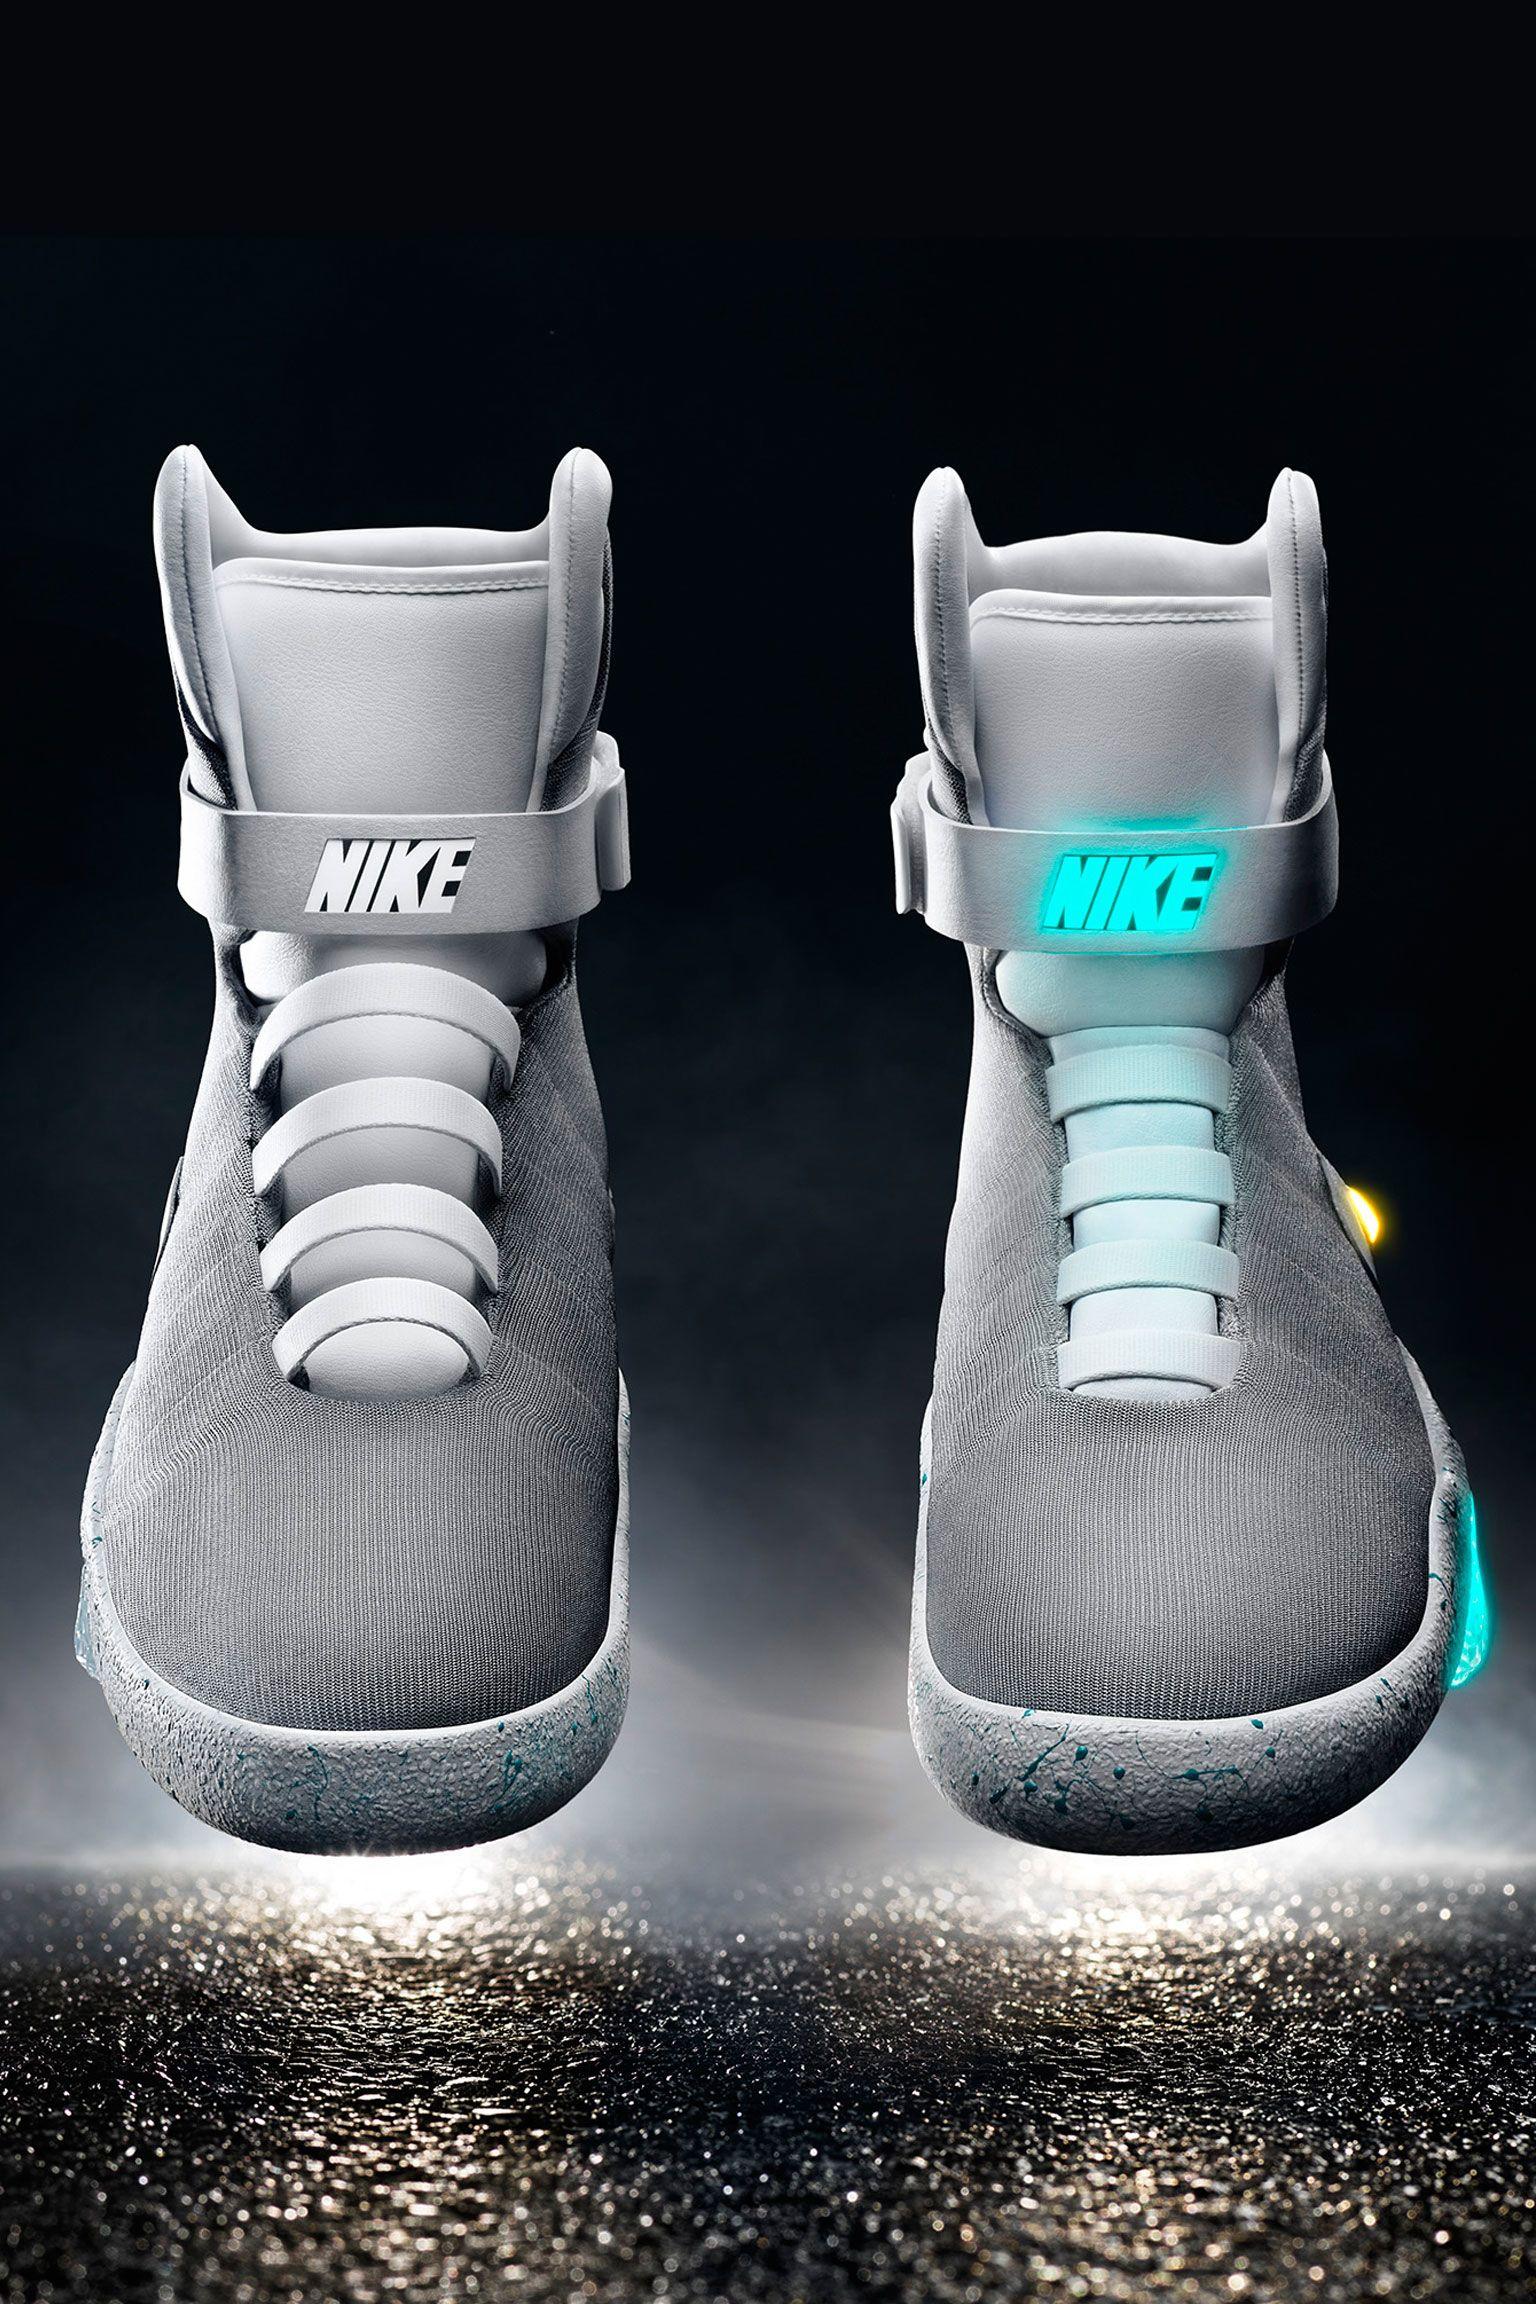 Nike Mag 2015